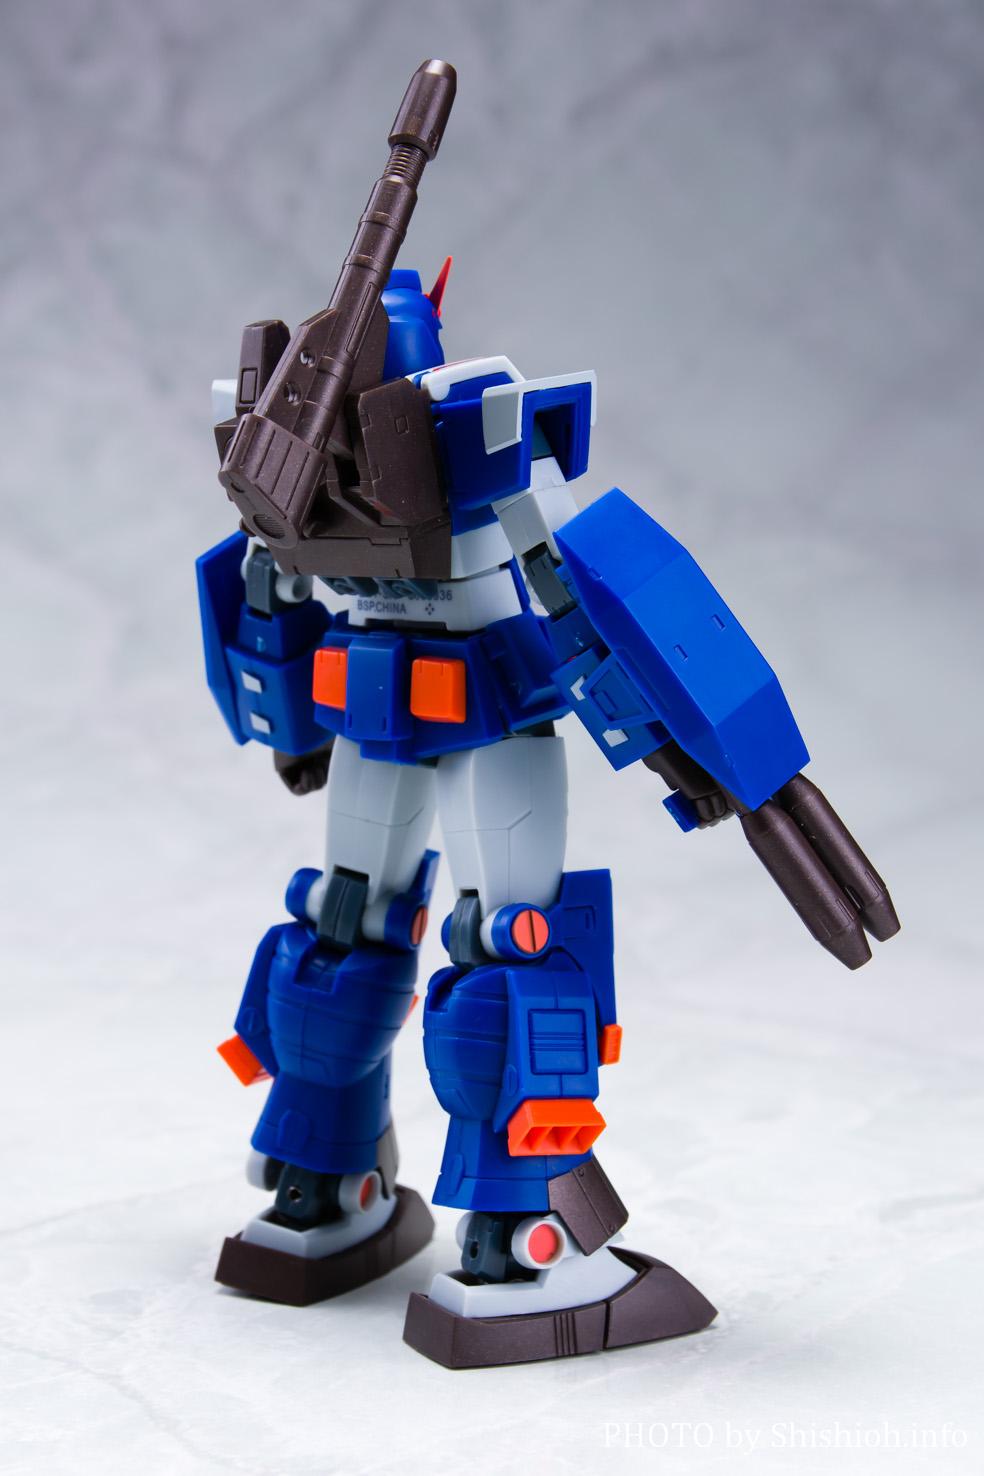 ROBOT魂 <SIDE MS> FA-78-1 パーフェクトガンダムII(フルアーマータイプ) ver. A.N.I.M.E.